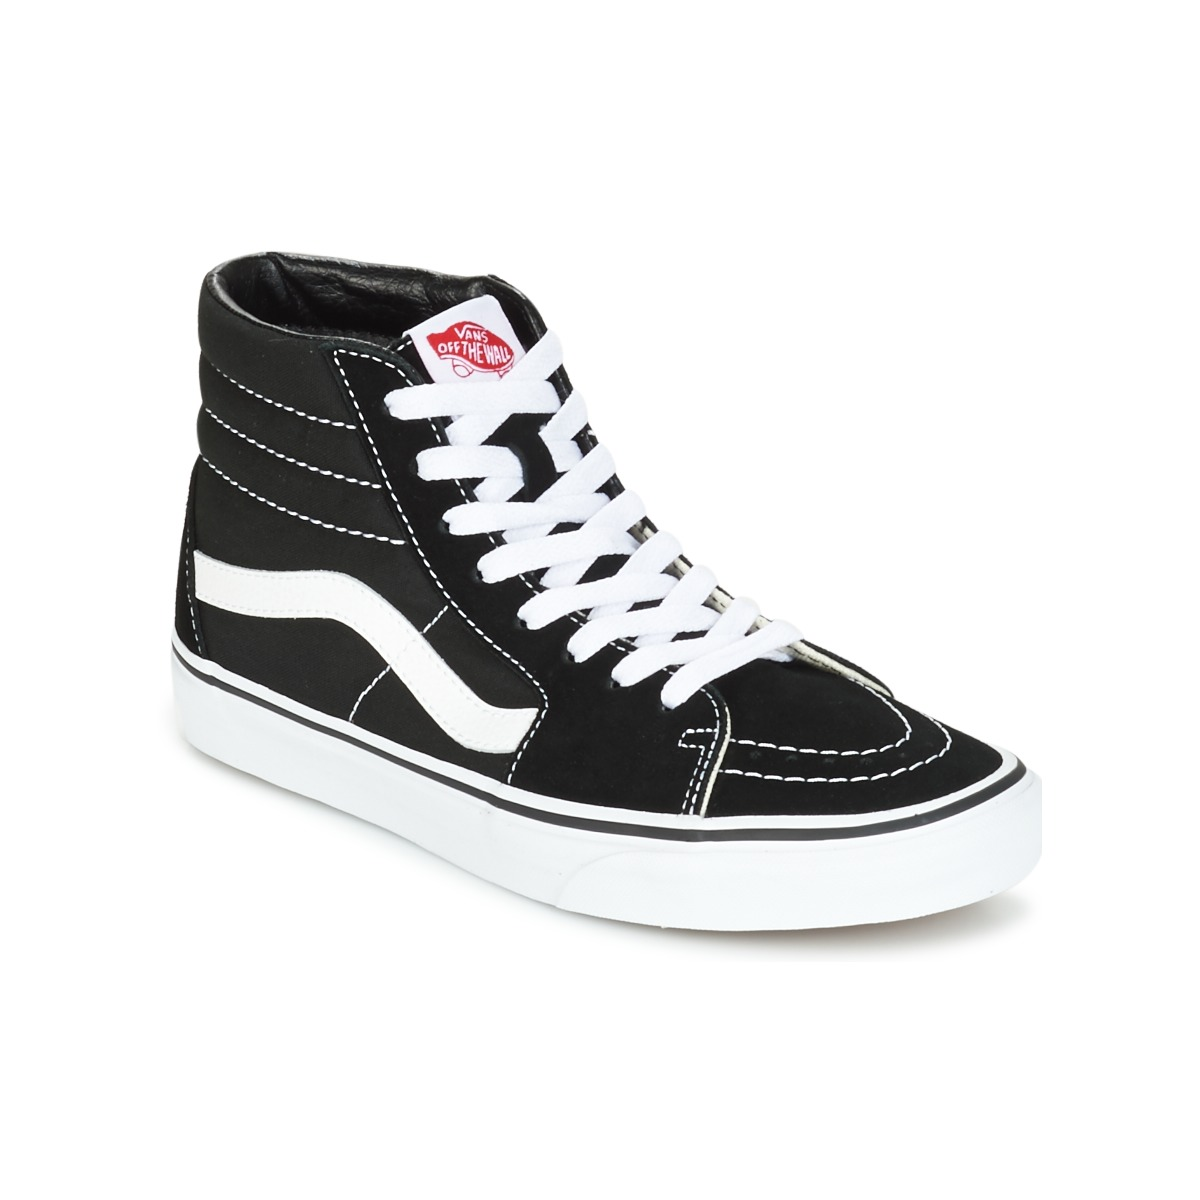 Vans SK8-HI Black / White